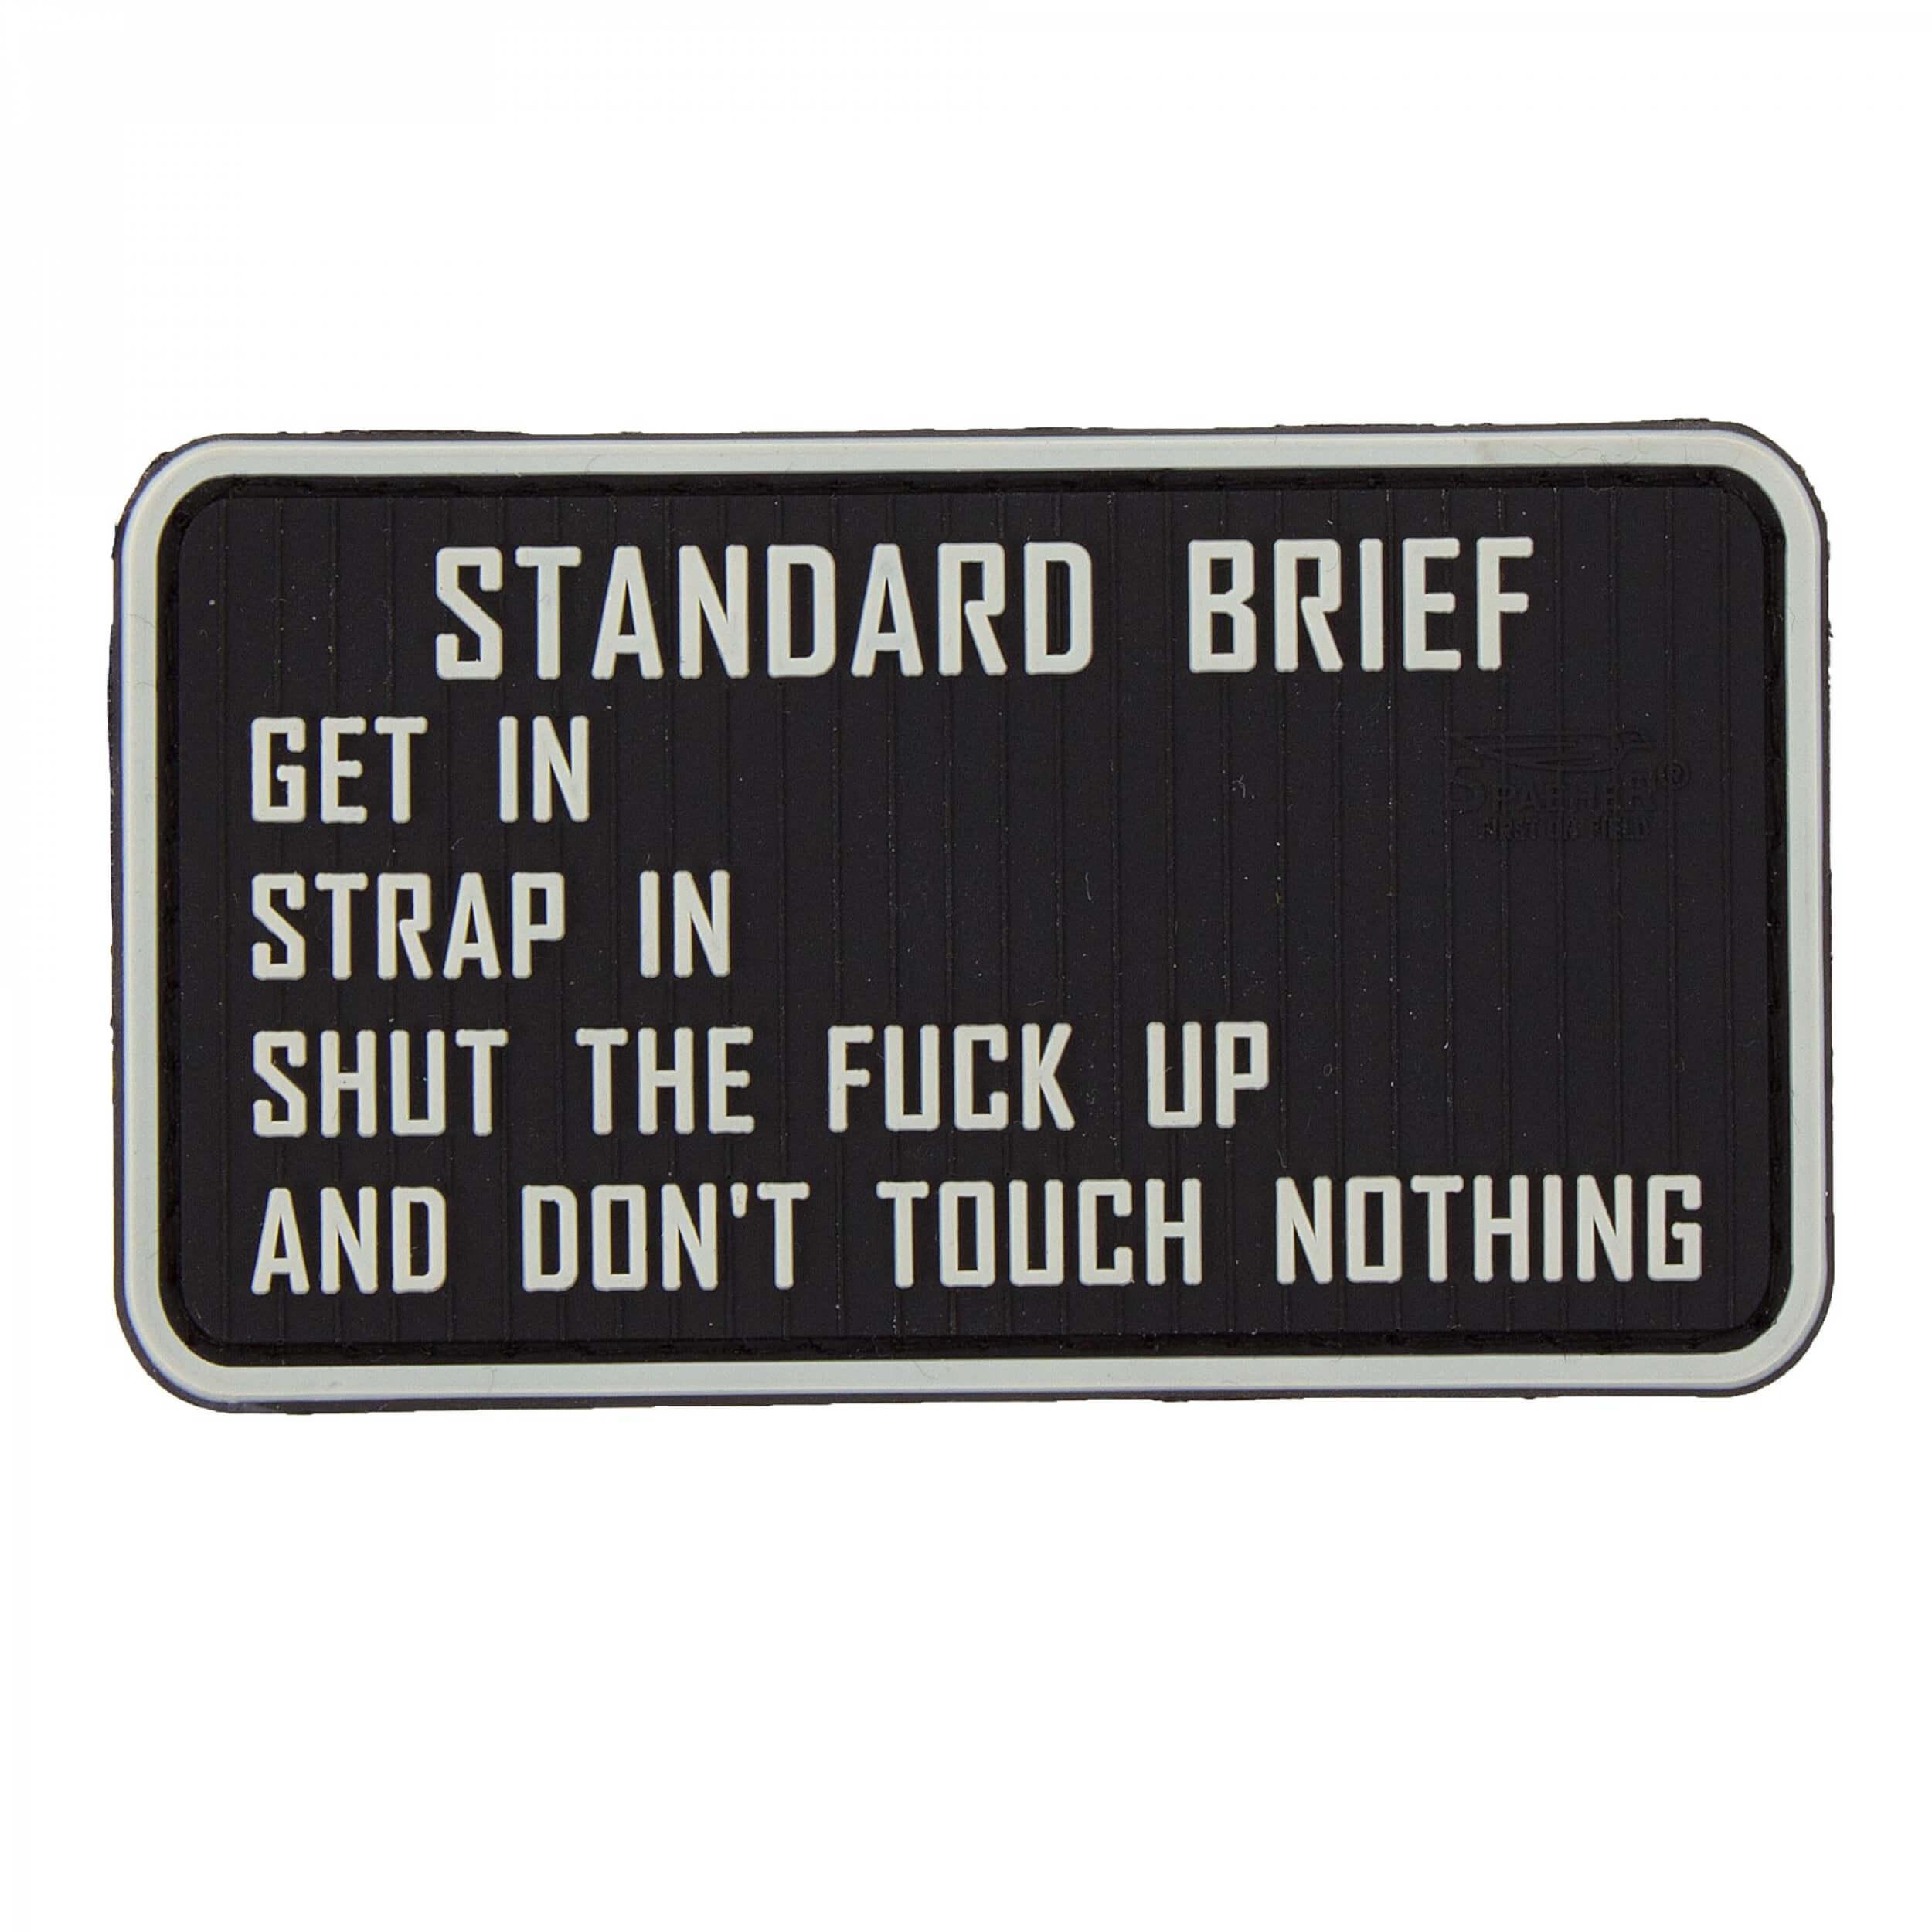 JTG Standard Briefing 3D Rubber Patch, fullcolour